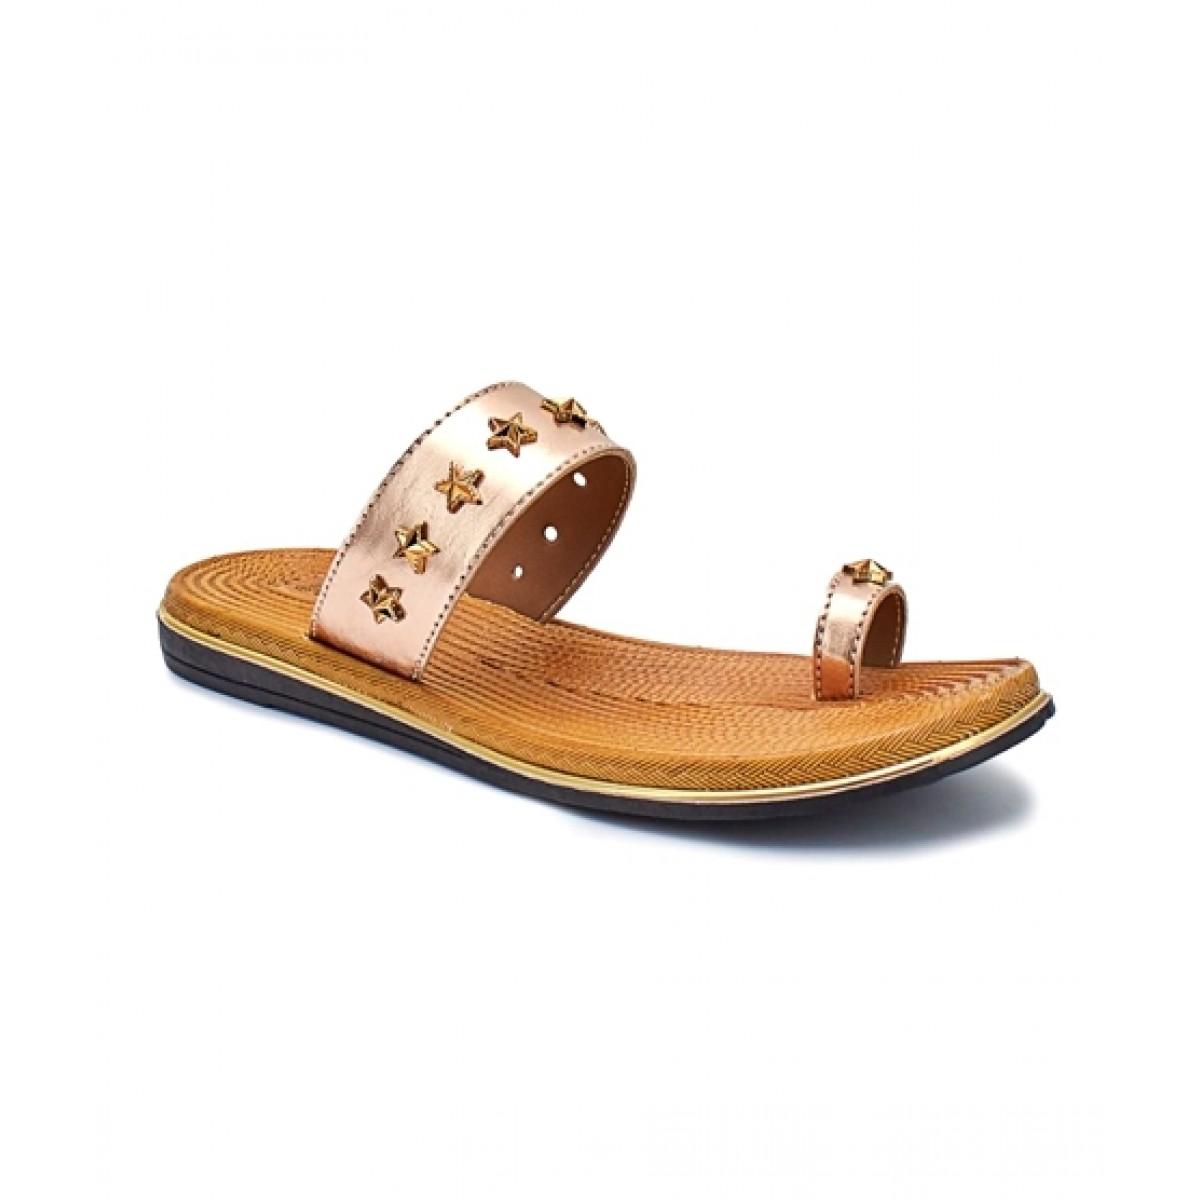 Servis Ndure Toe Ring Chappal For Women Rose-Gold (ND-CU-0066)